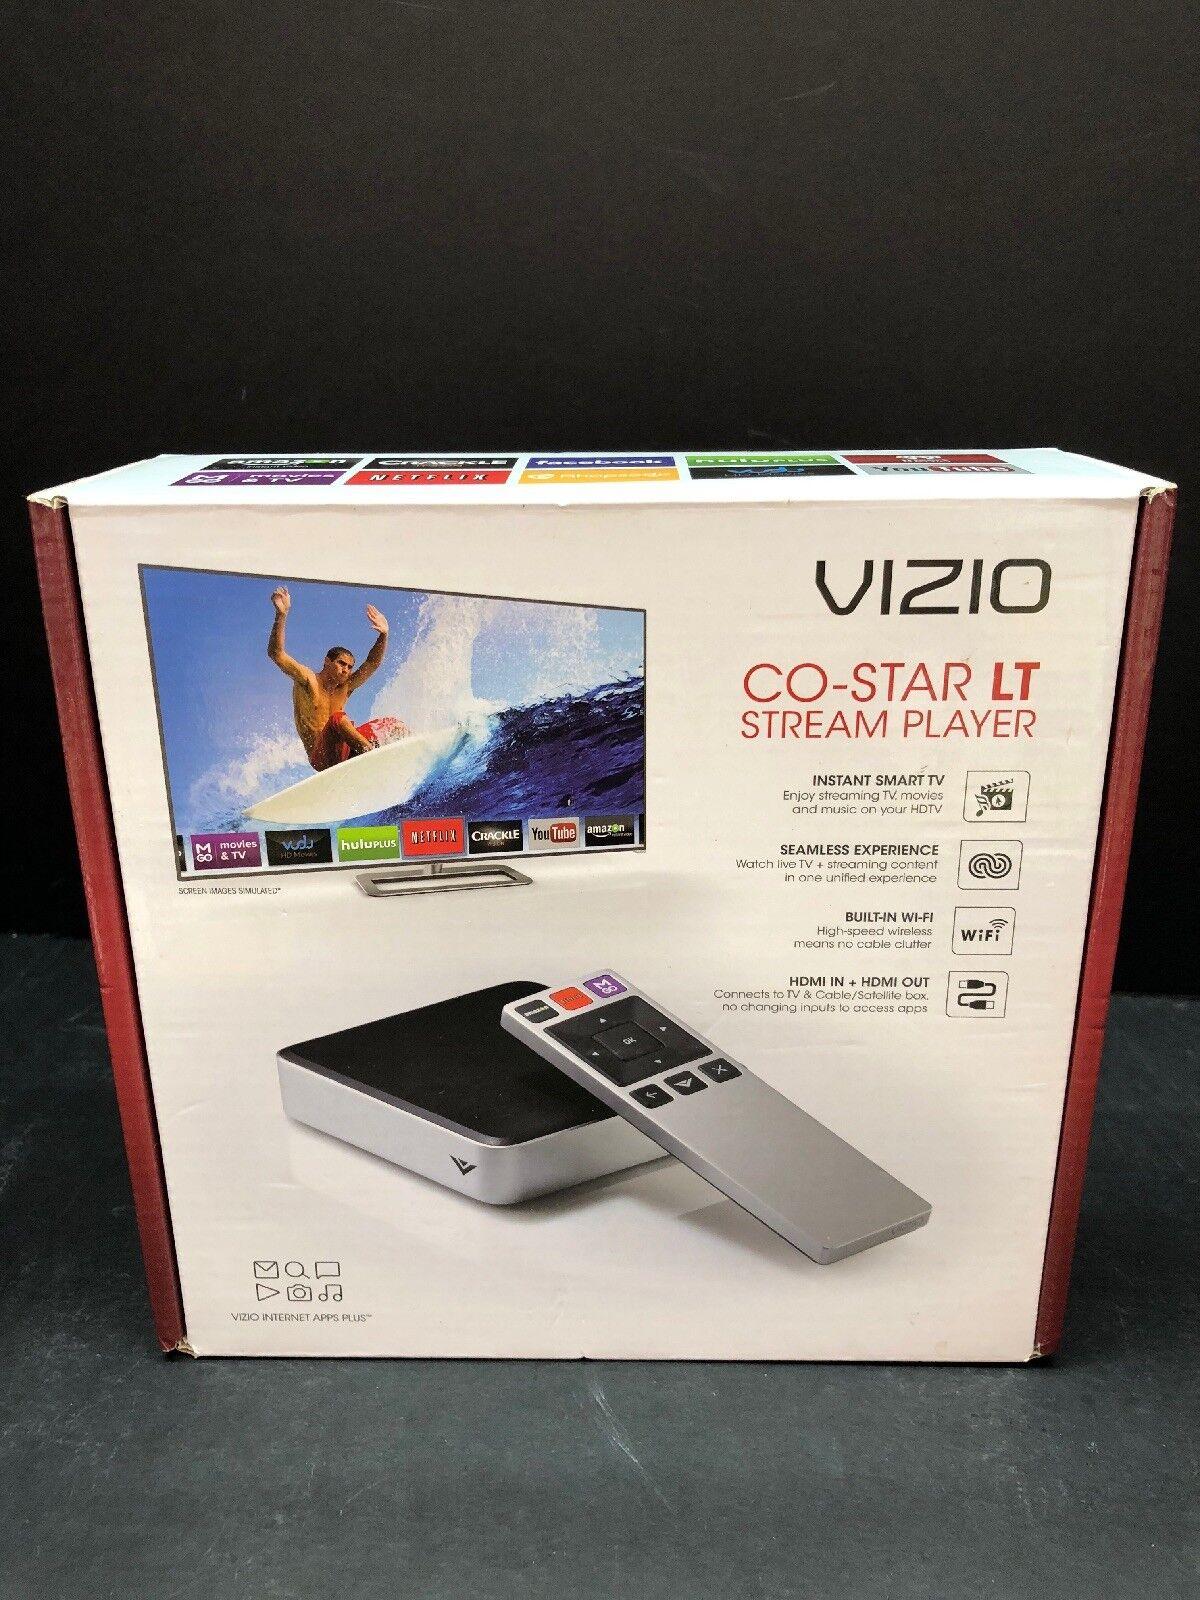 VIZIO Co-Star LT Digital Media Streamer